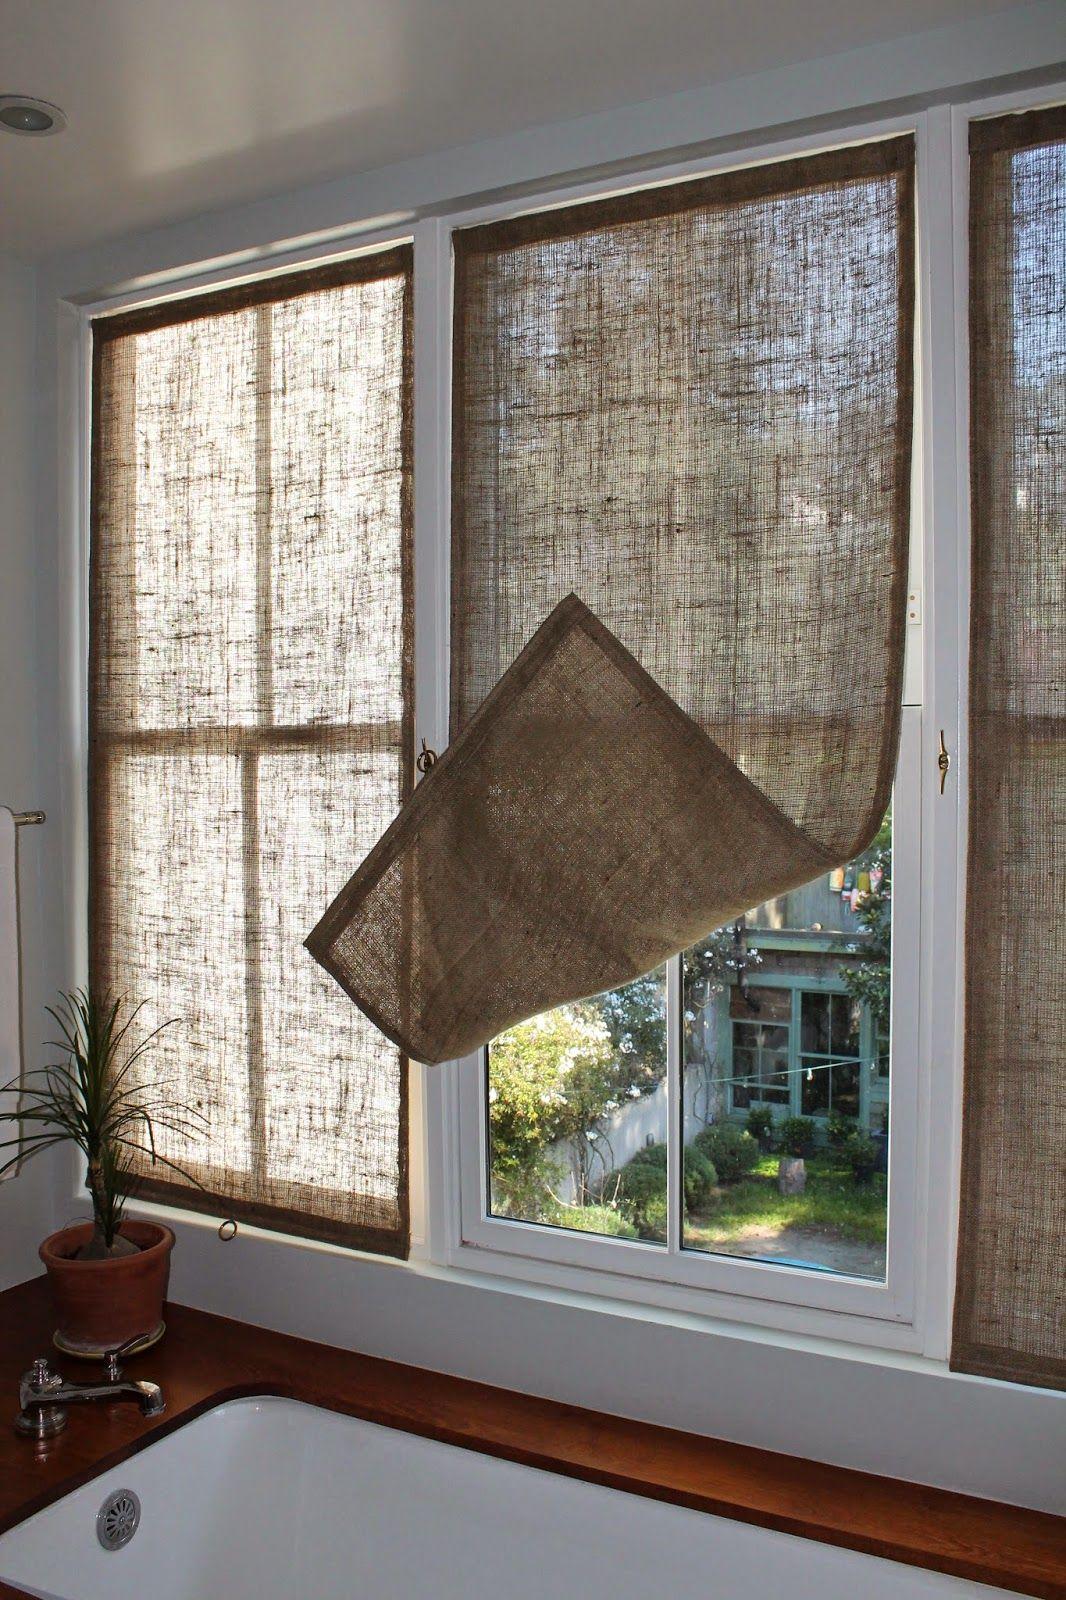 Bathroom window decor  the shingled house  burlap window shades  home bird  pinterest